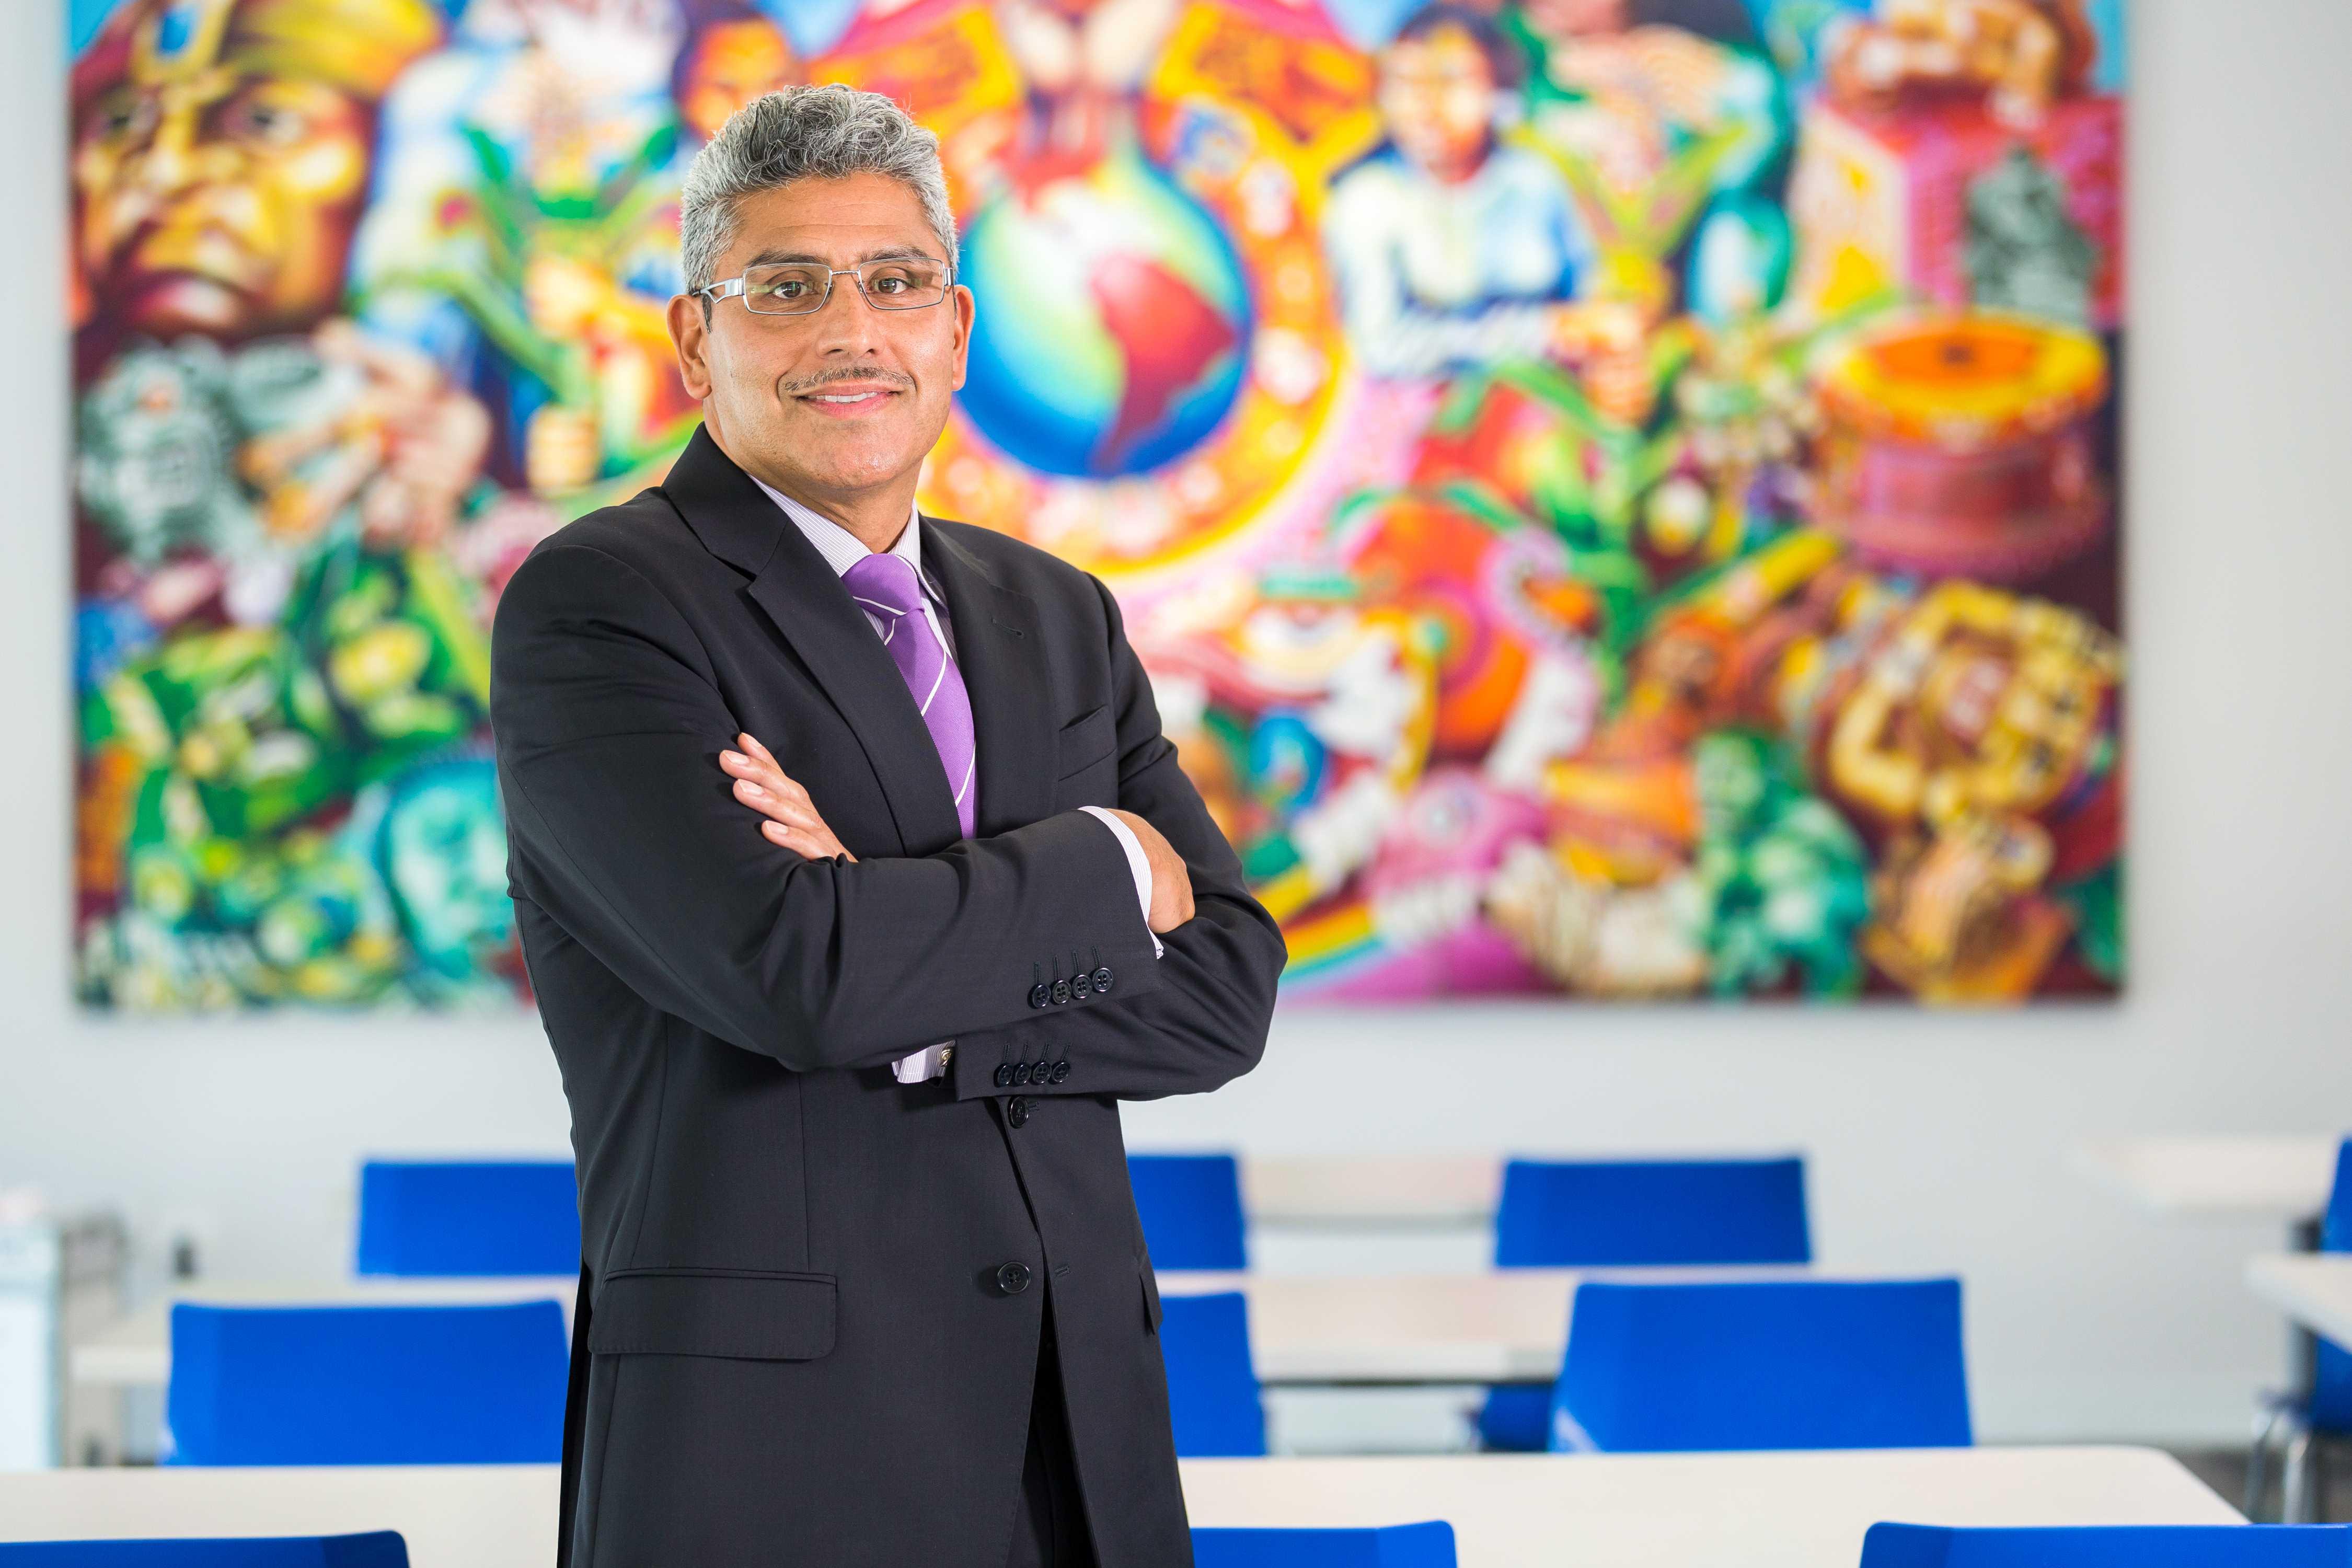 Juan Salgado, CEO of Instituto Del Progreso Latino, at his office in Chicago, Tuesday, September 15, 2015.